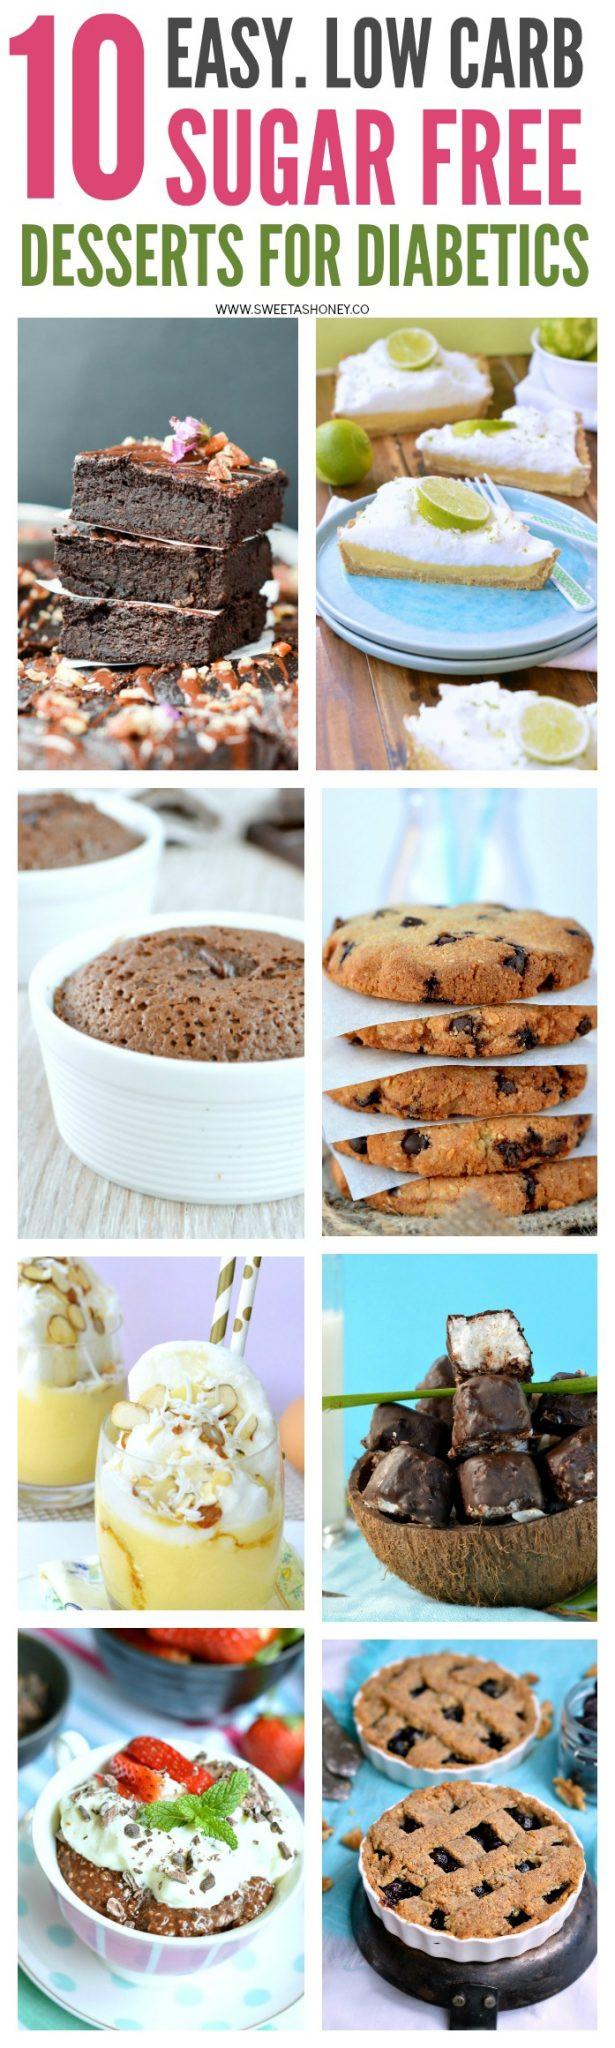 Sugar Free Desserts Recipes For Diabetics  10 Sugar Free Desserts for diabetics Sweetashoney